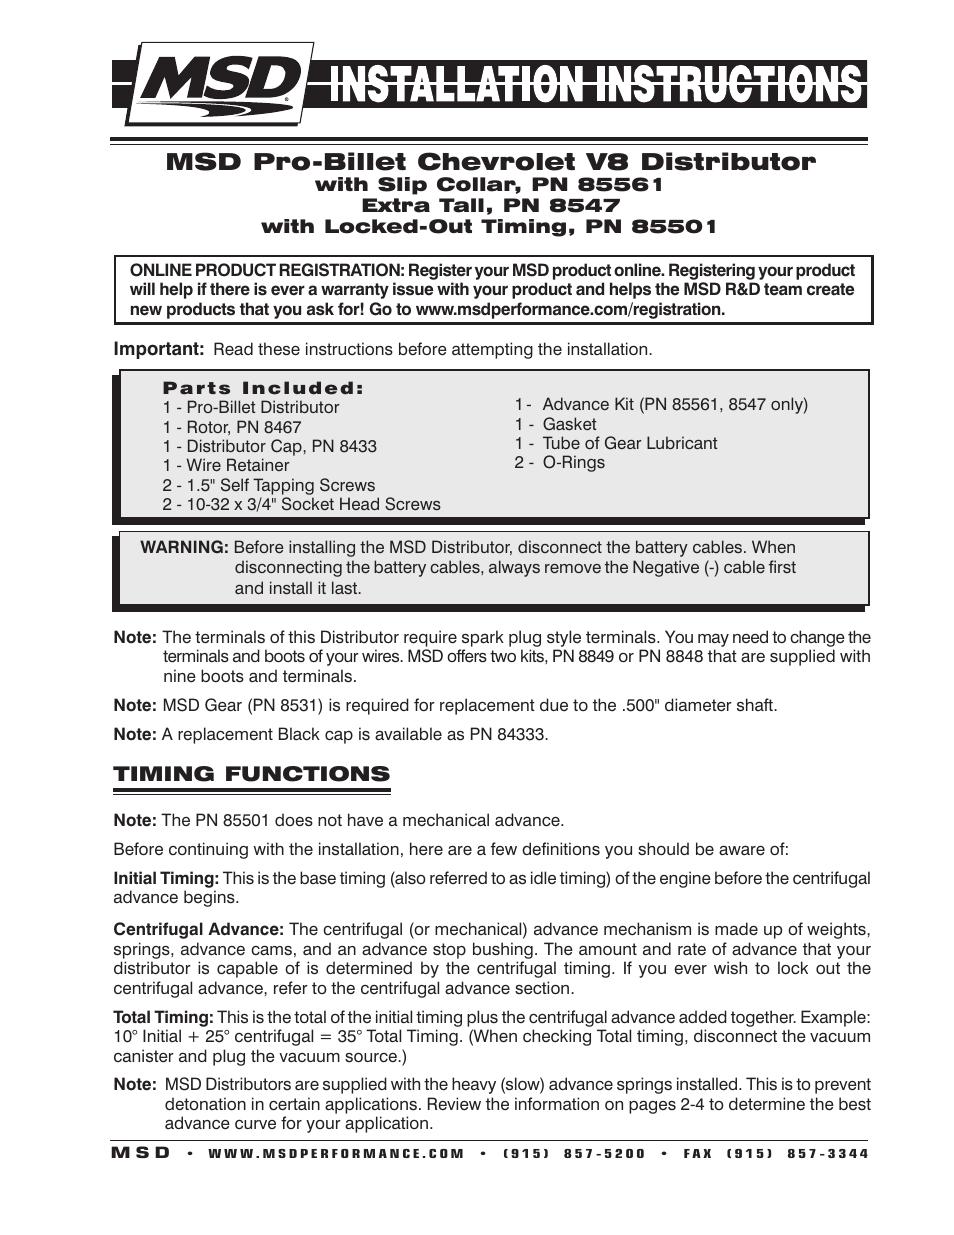 Msd Distributor 85561 Wiring Diagram Chevy Pro Billet Installation User Manual 954x1235